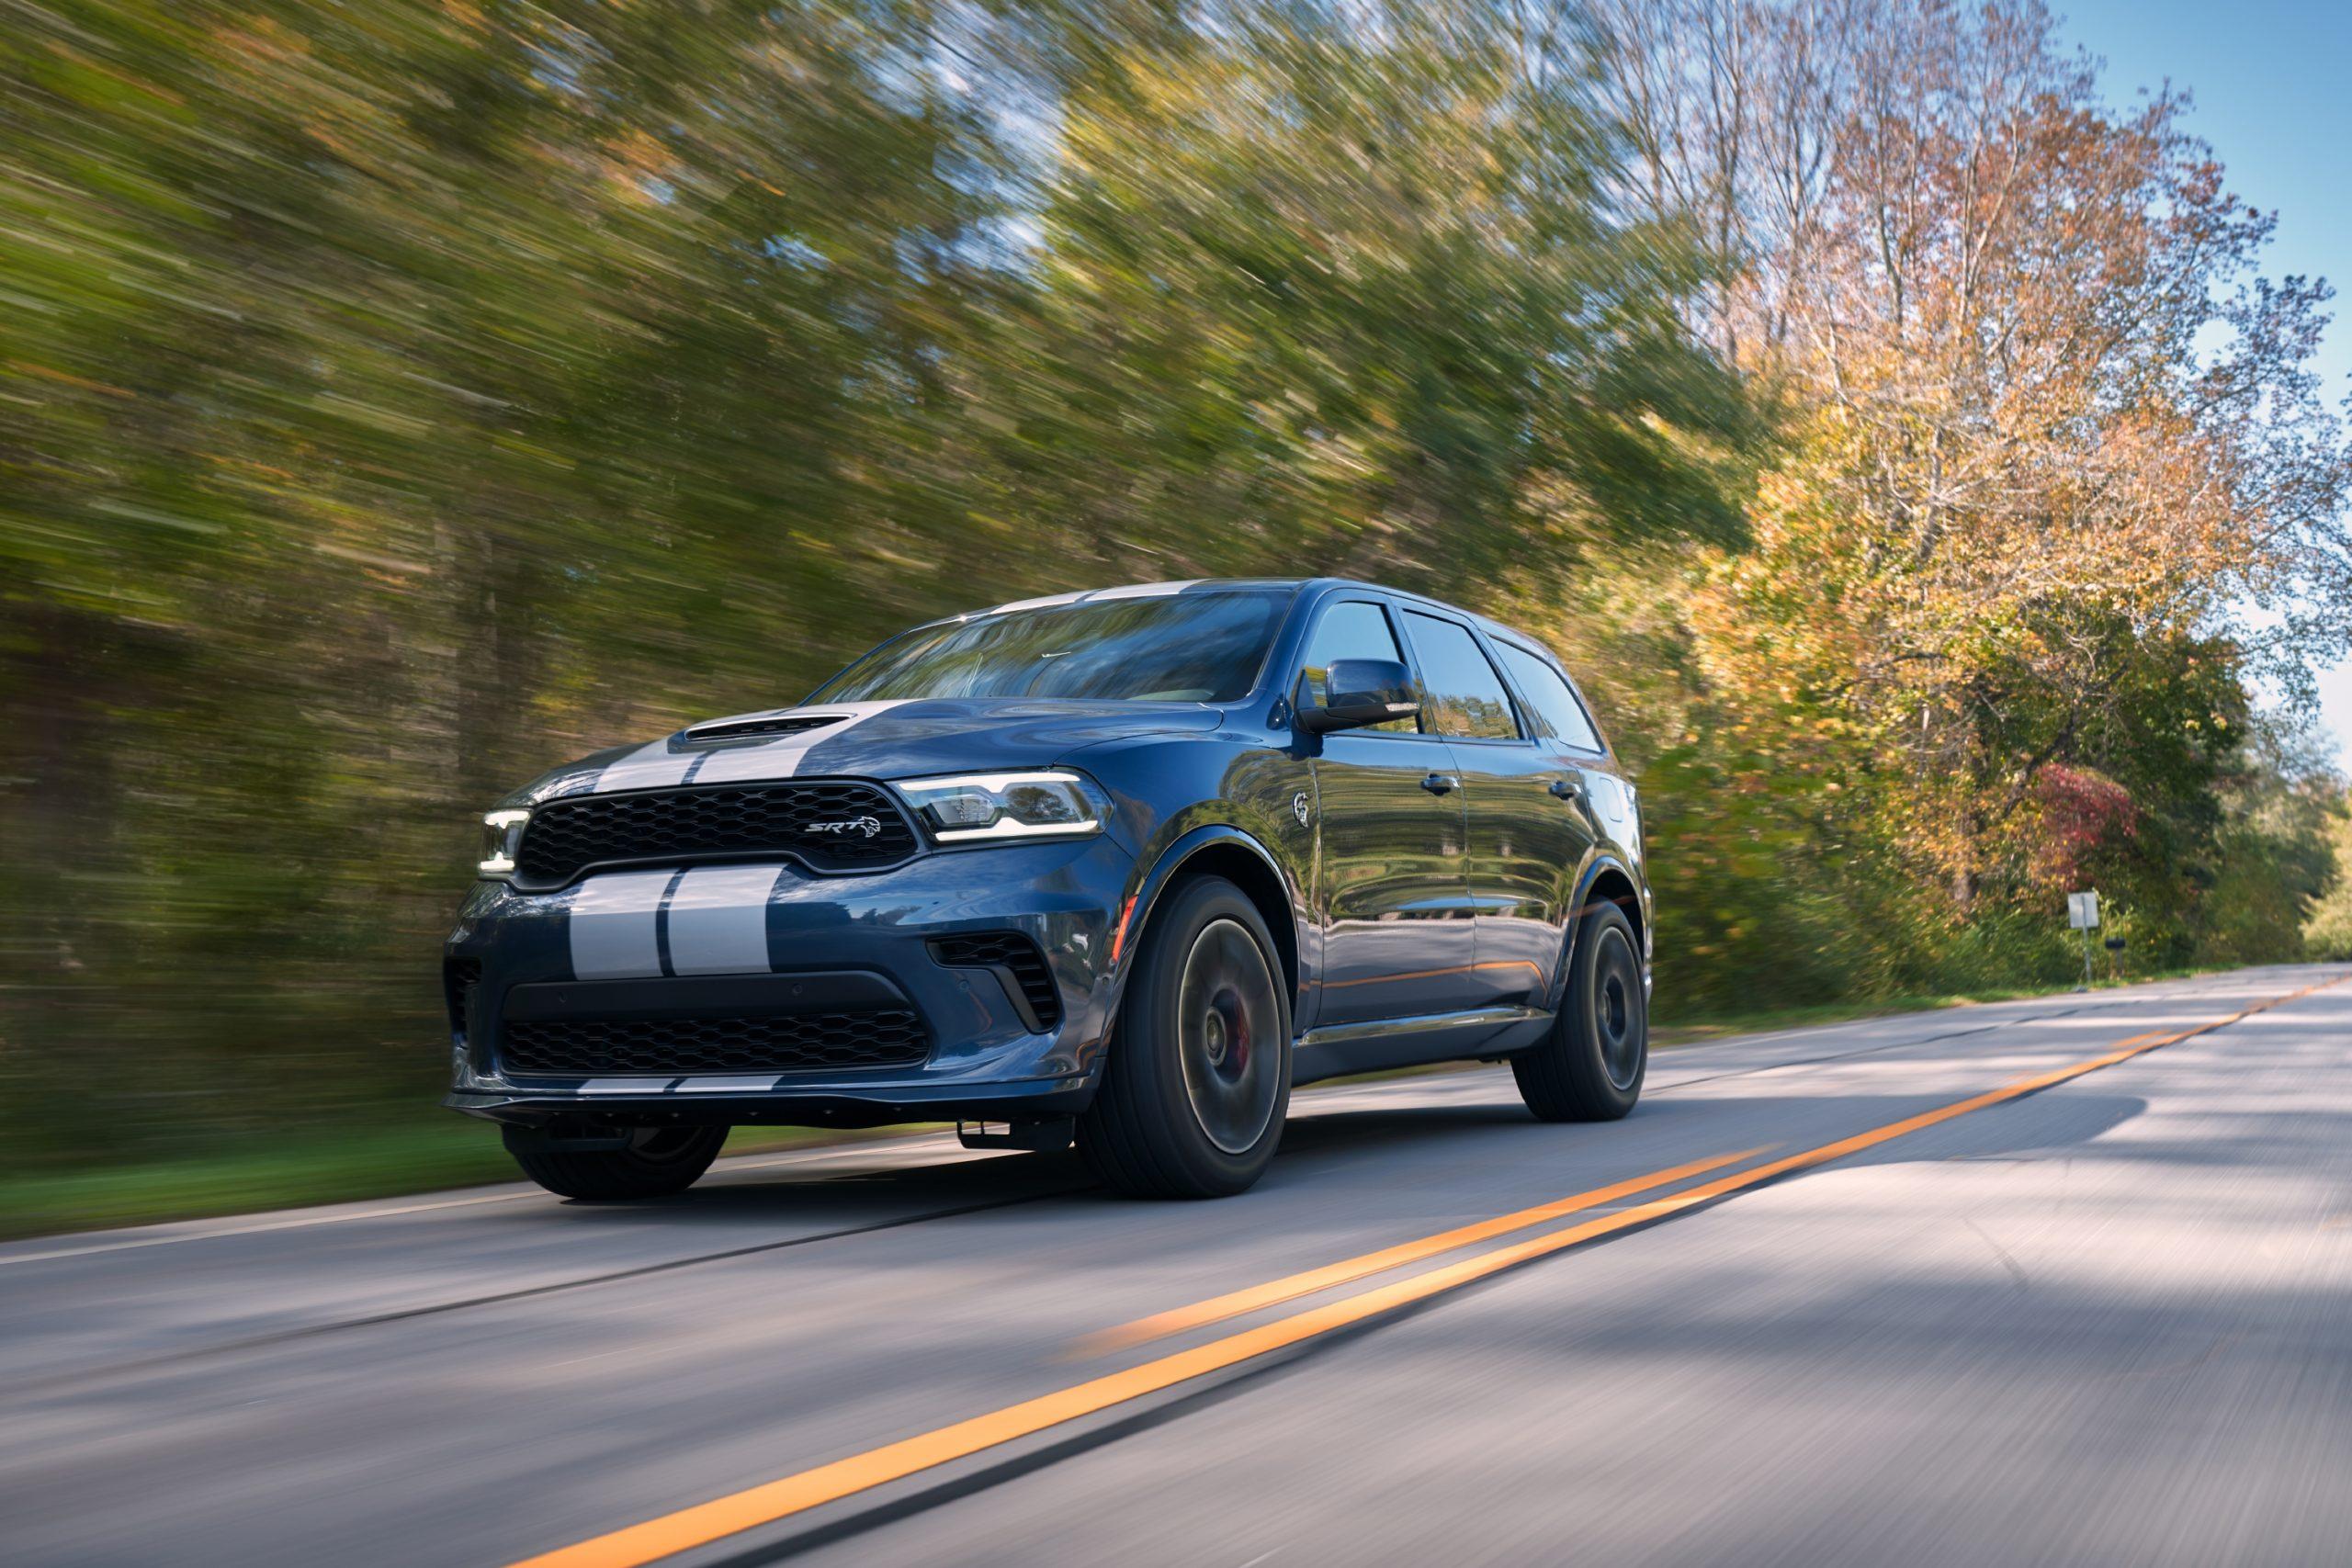 2021 Dodge Durango SRT Hellcat reactor blue silver stripes front three-quarter action